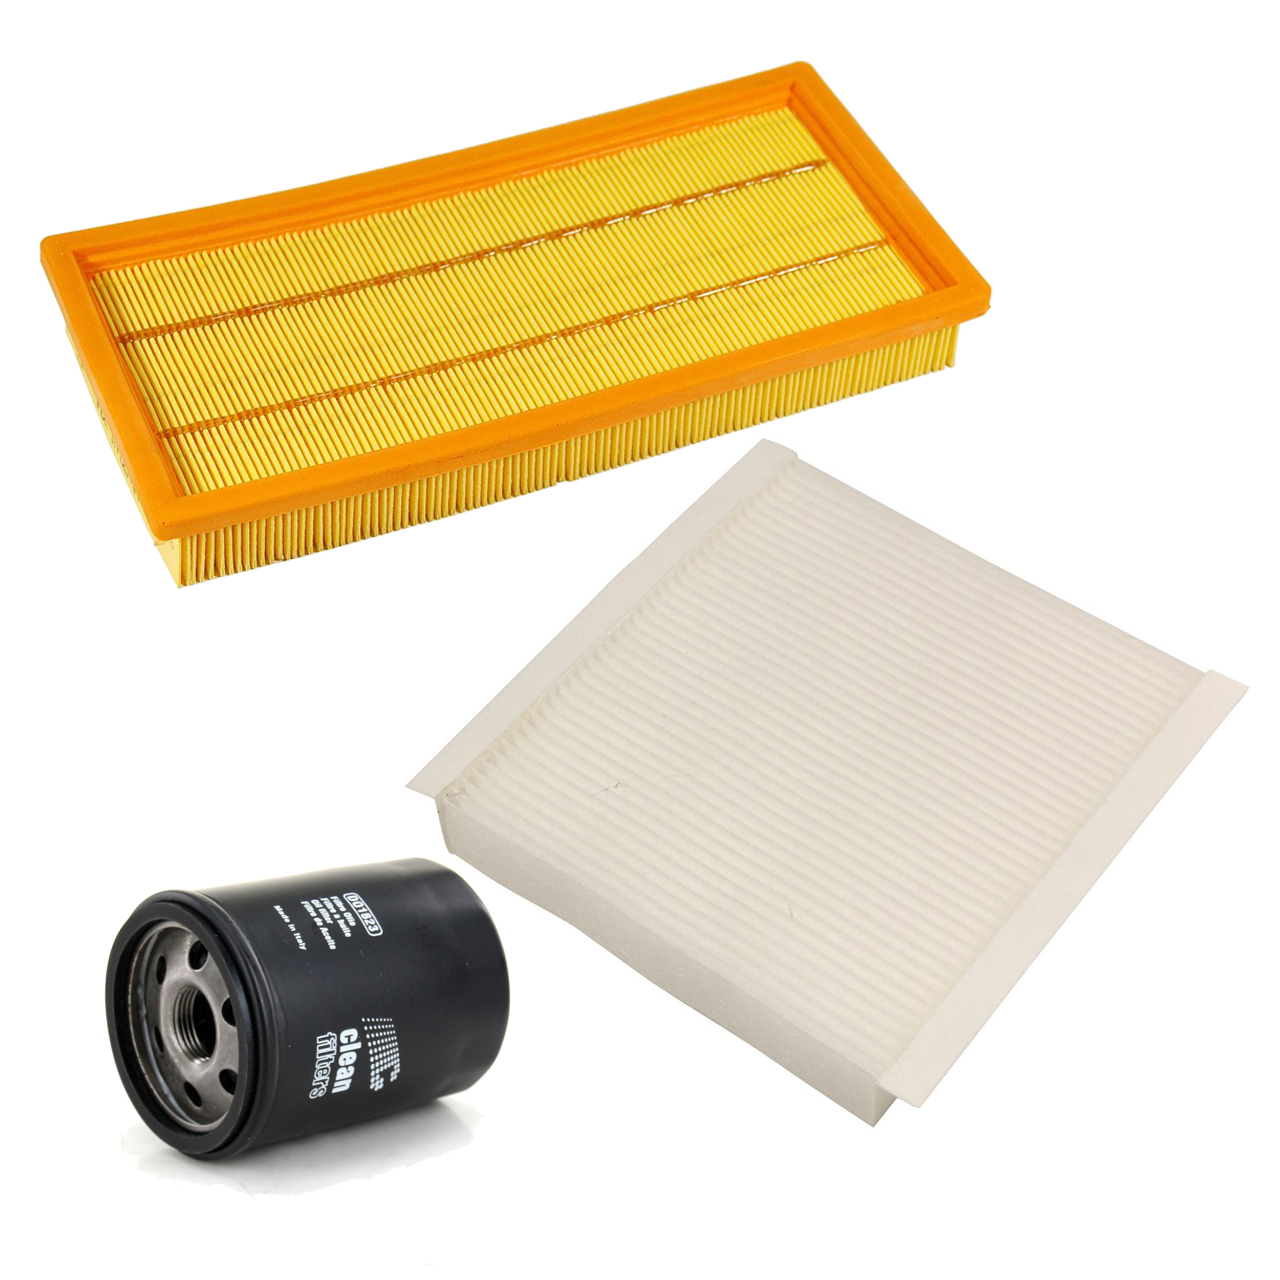 Inspektionskit Filterpaket Filterset FIAT Doblo 263 Tipo 356 1.4 95 PS